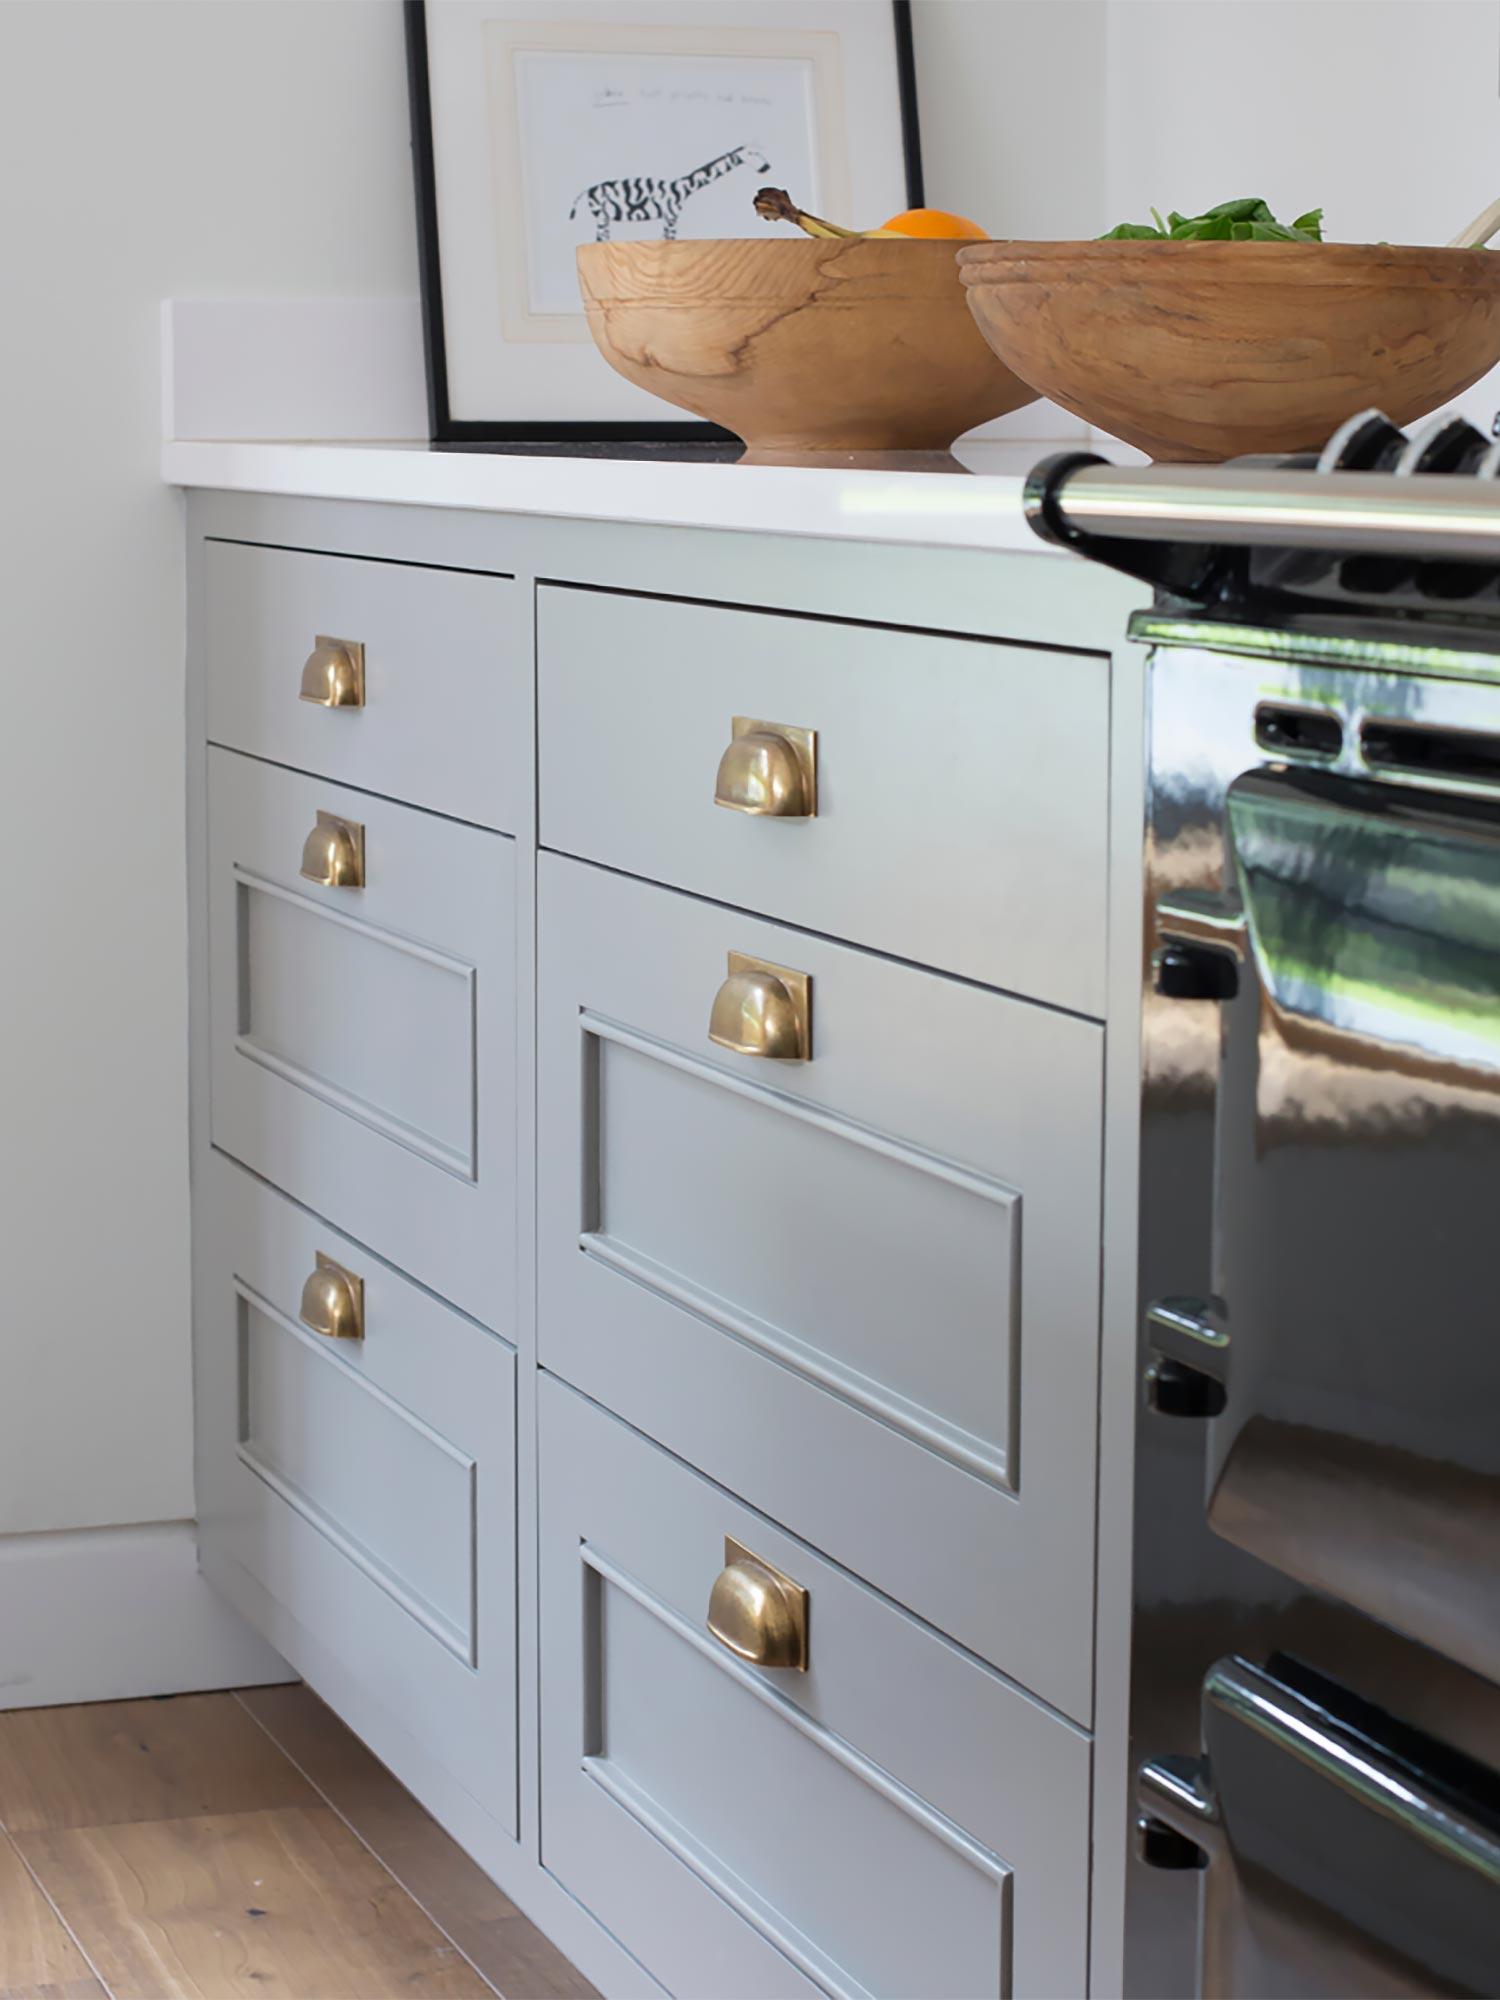 Armac handle design kitchen drawers - Hubble Kitchens